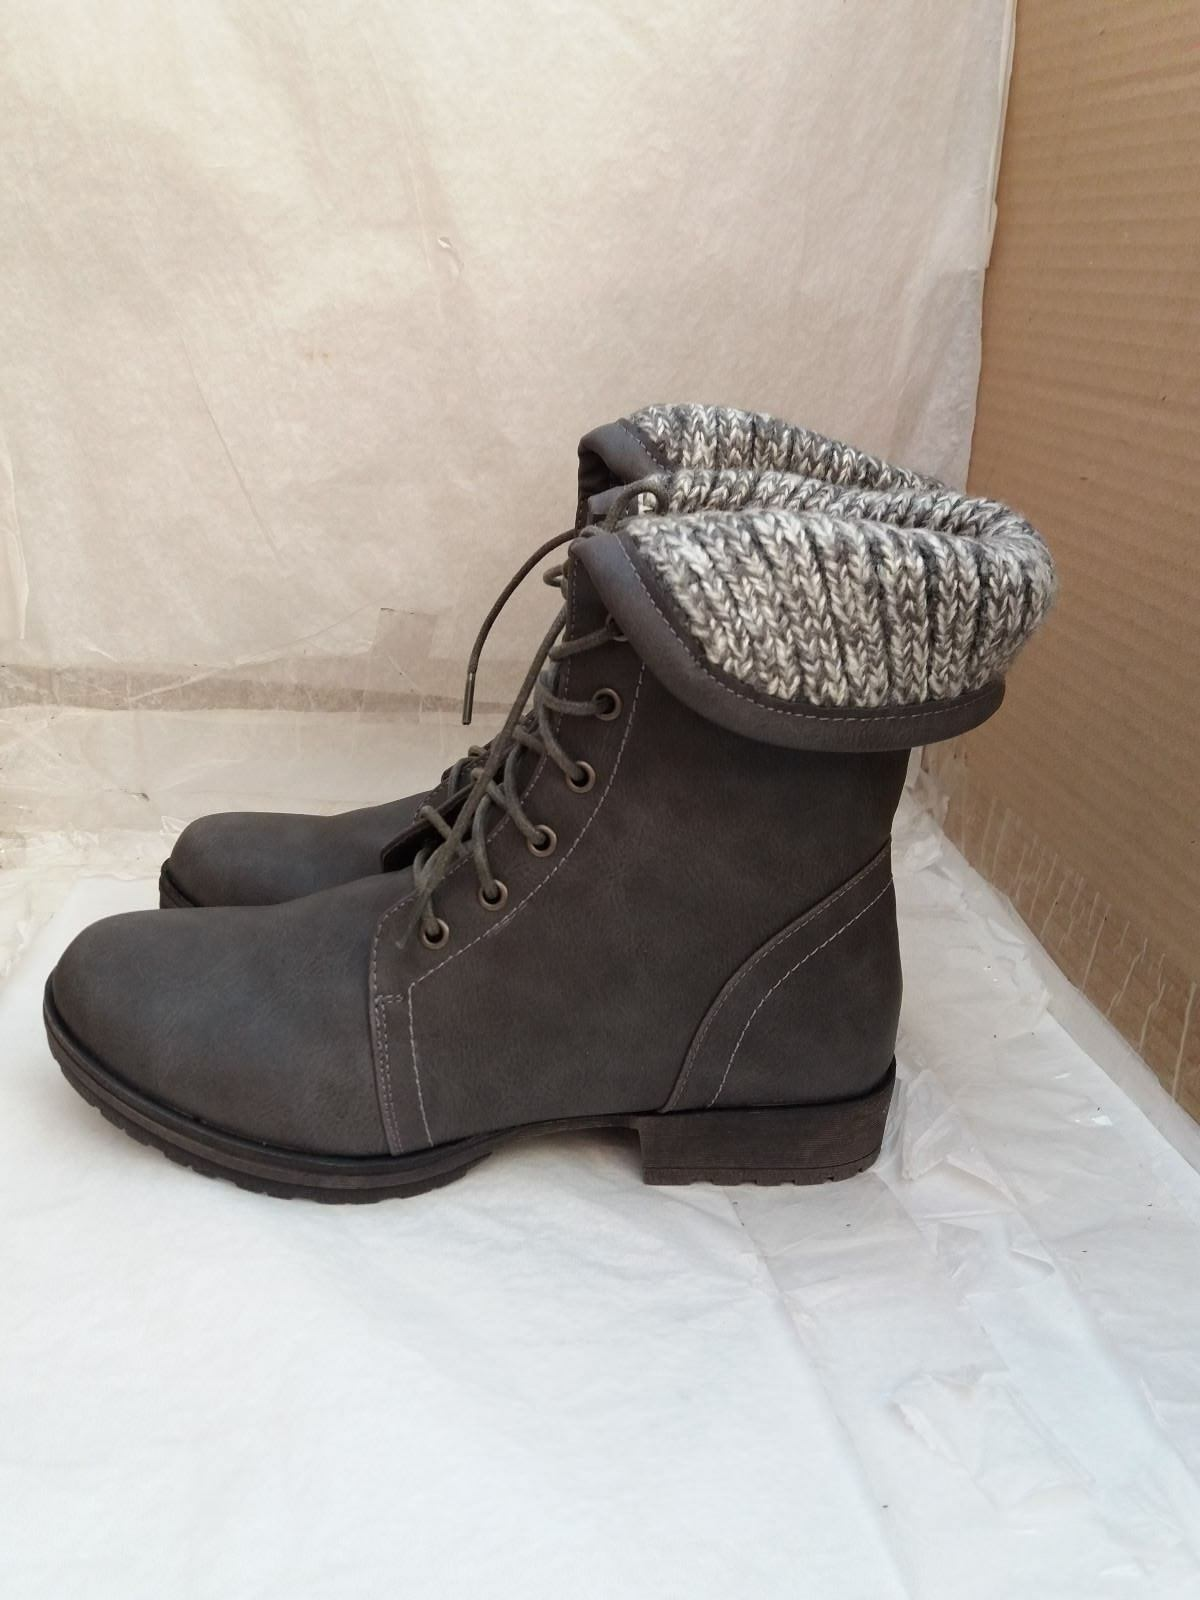 Just Fabulous Brayndis Bootie - Grau - UK - Größe 5 - UK 22e845